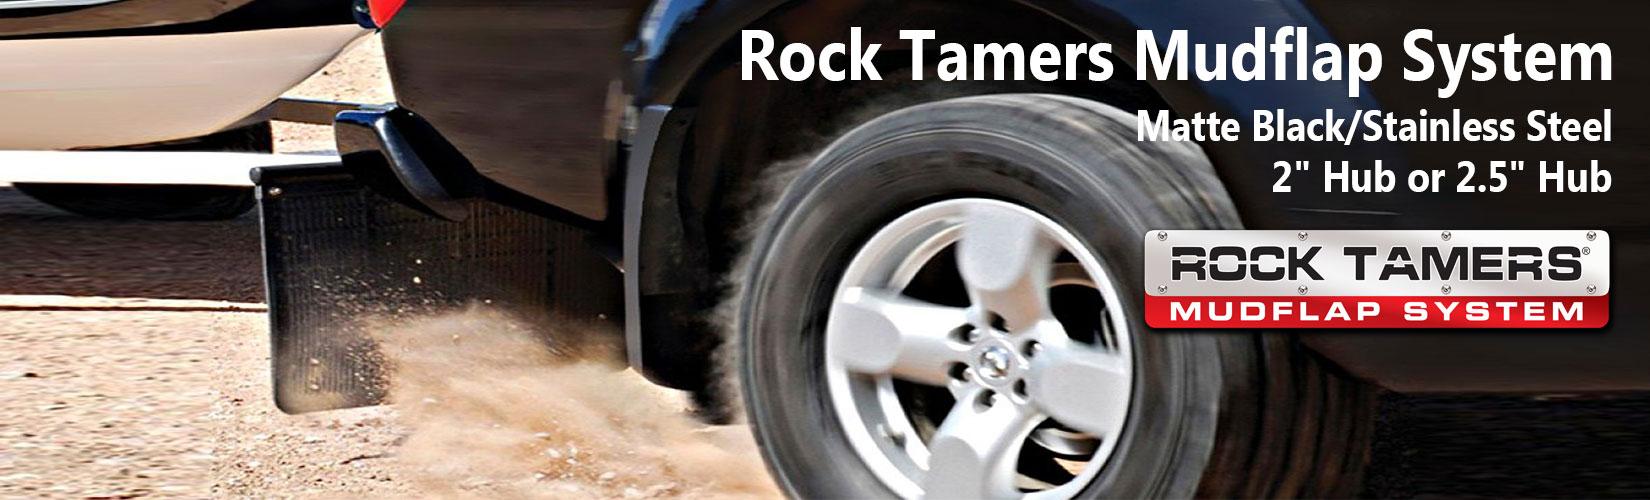 Rock Tamers MudFlap System - Mud Flaps